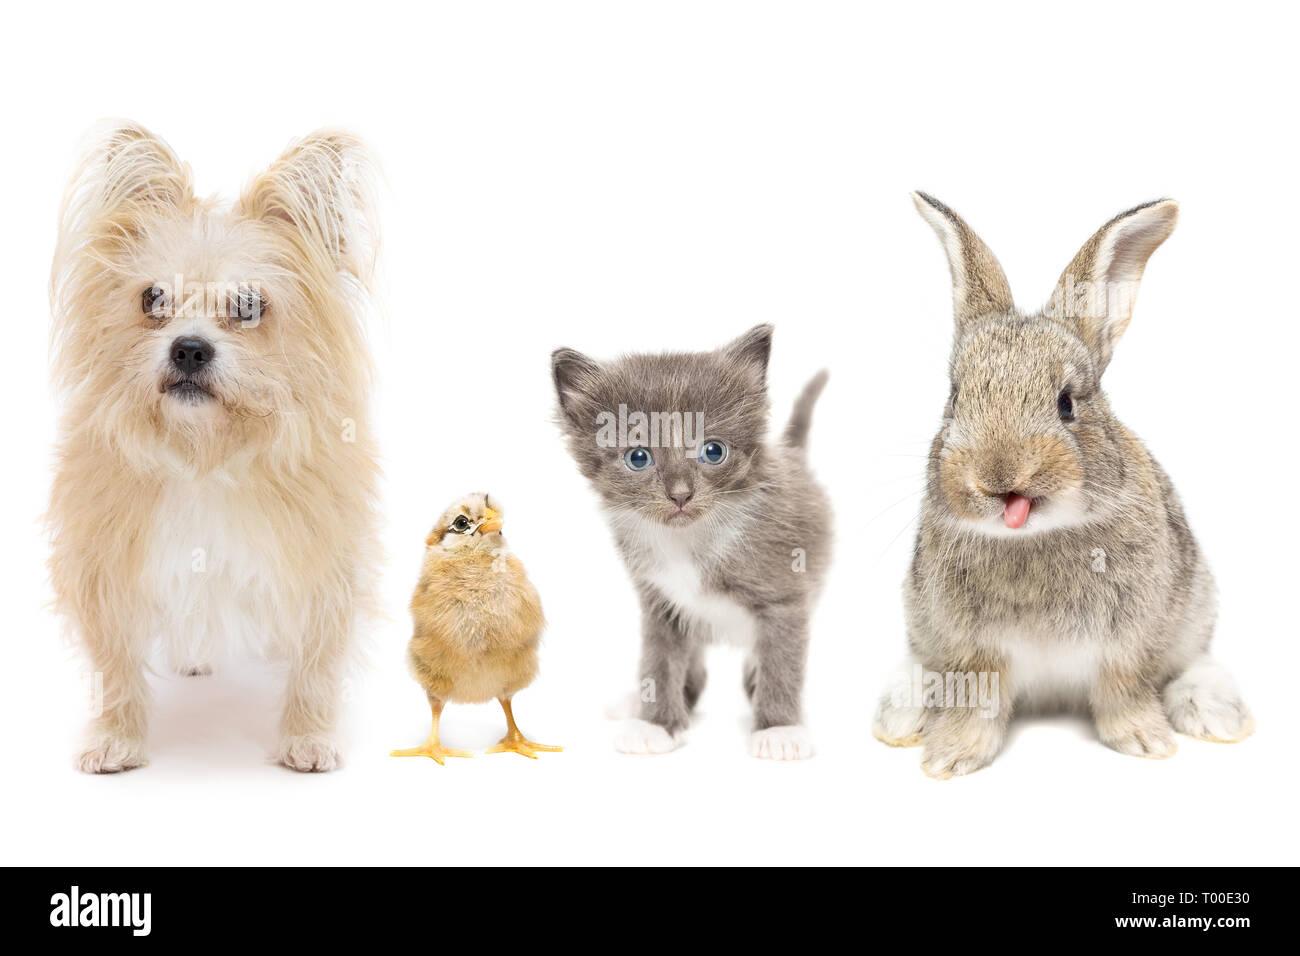 Dog chicken Kitten and rabbit on white background - Stock Image